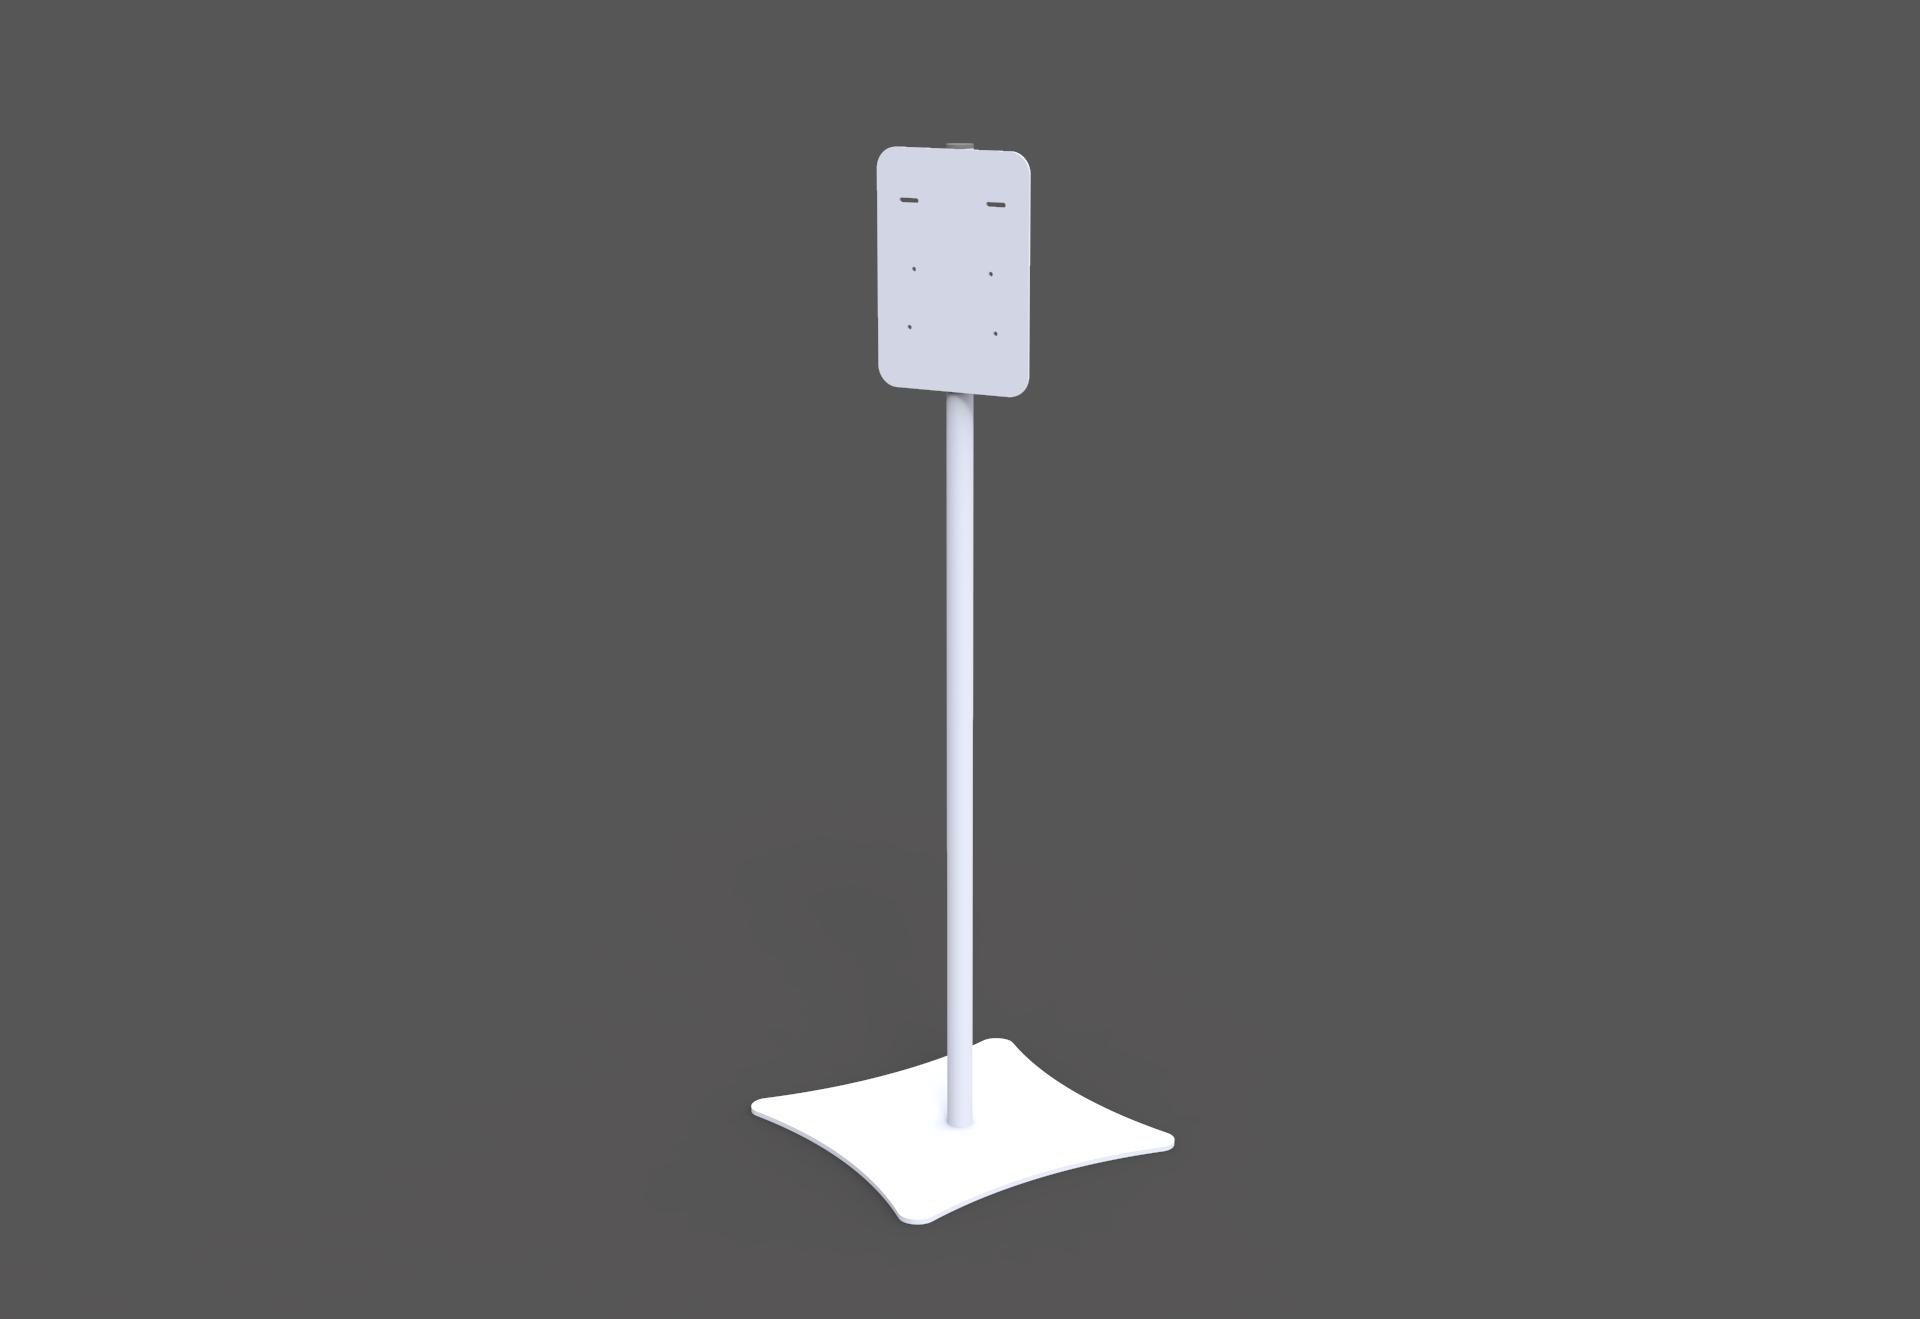 Tradeline - Sanitizer Stand Rev B.26